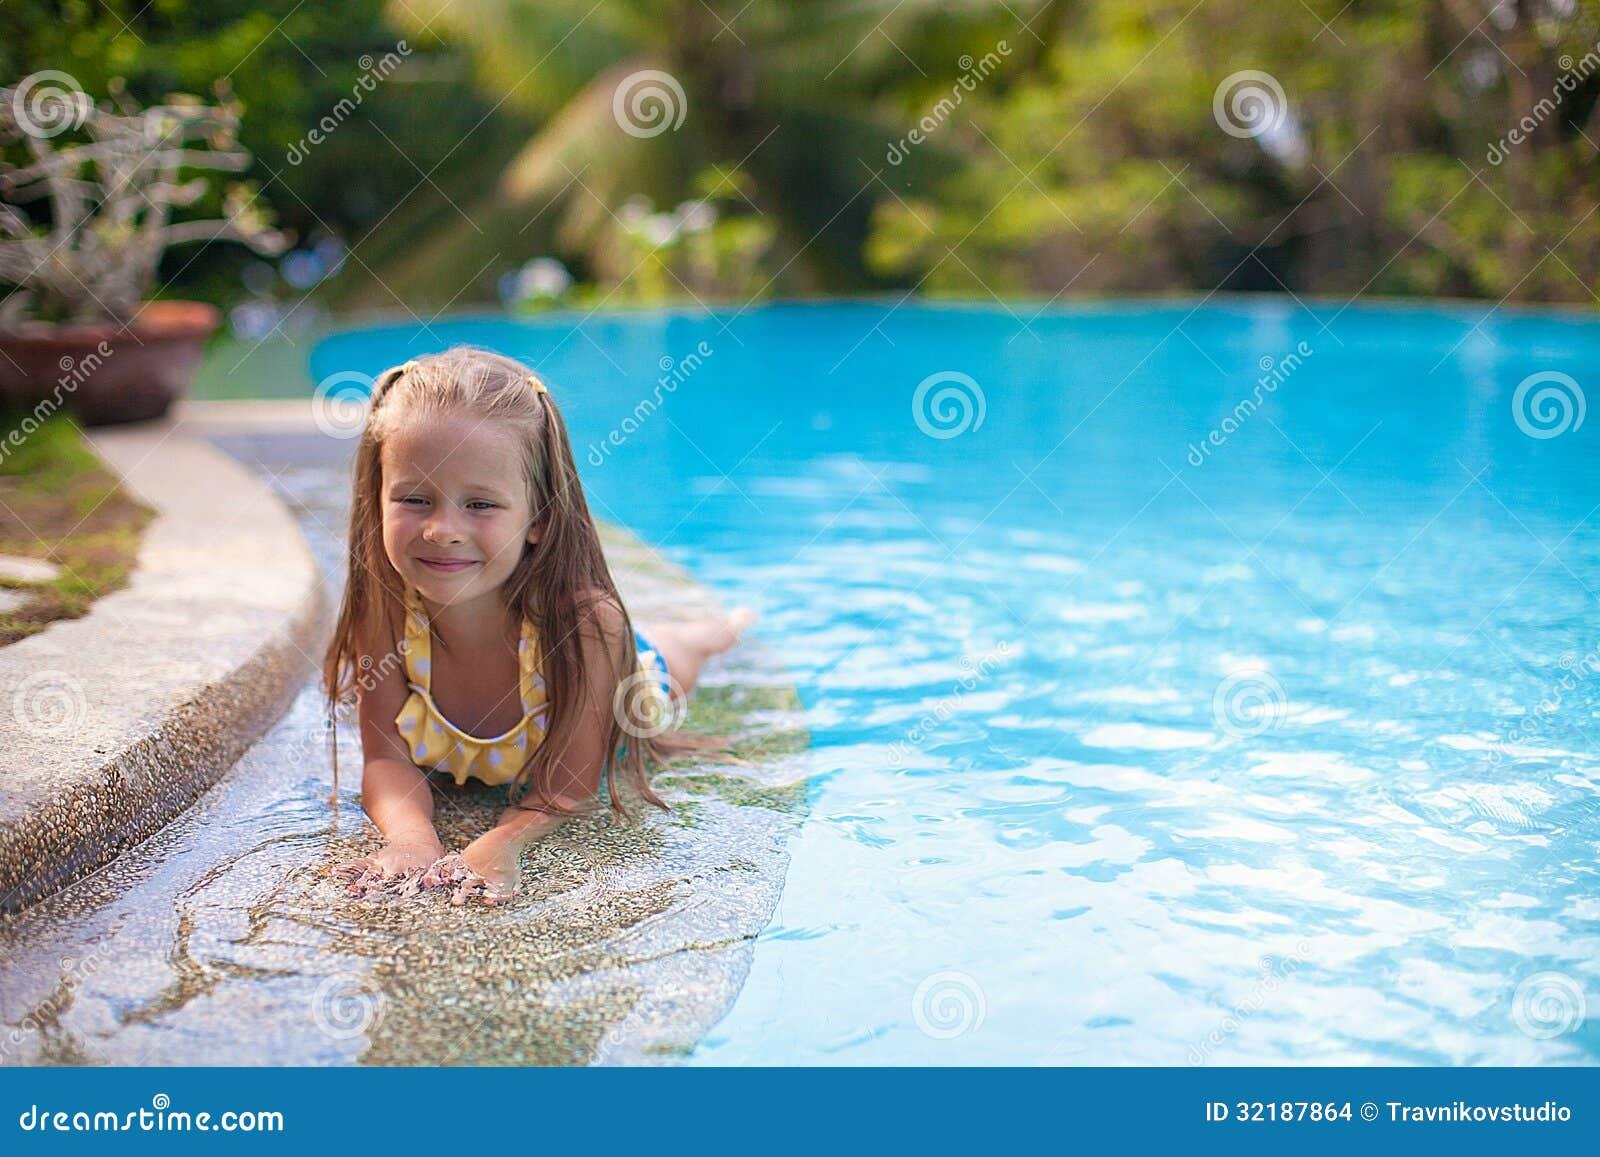 Discuss Sweet girls swim pool what